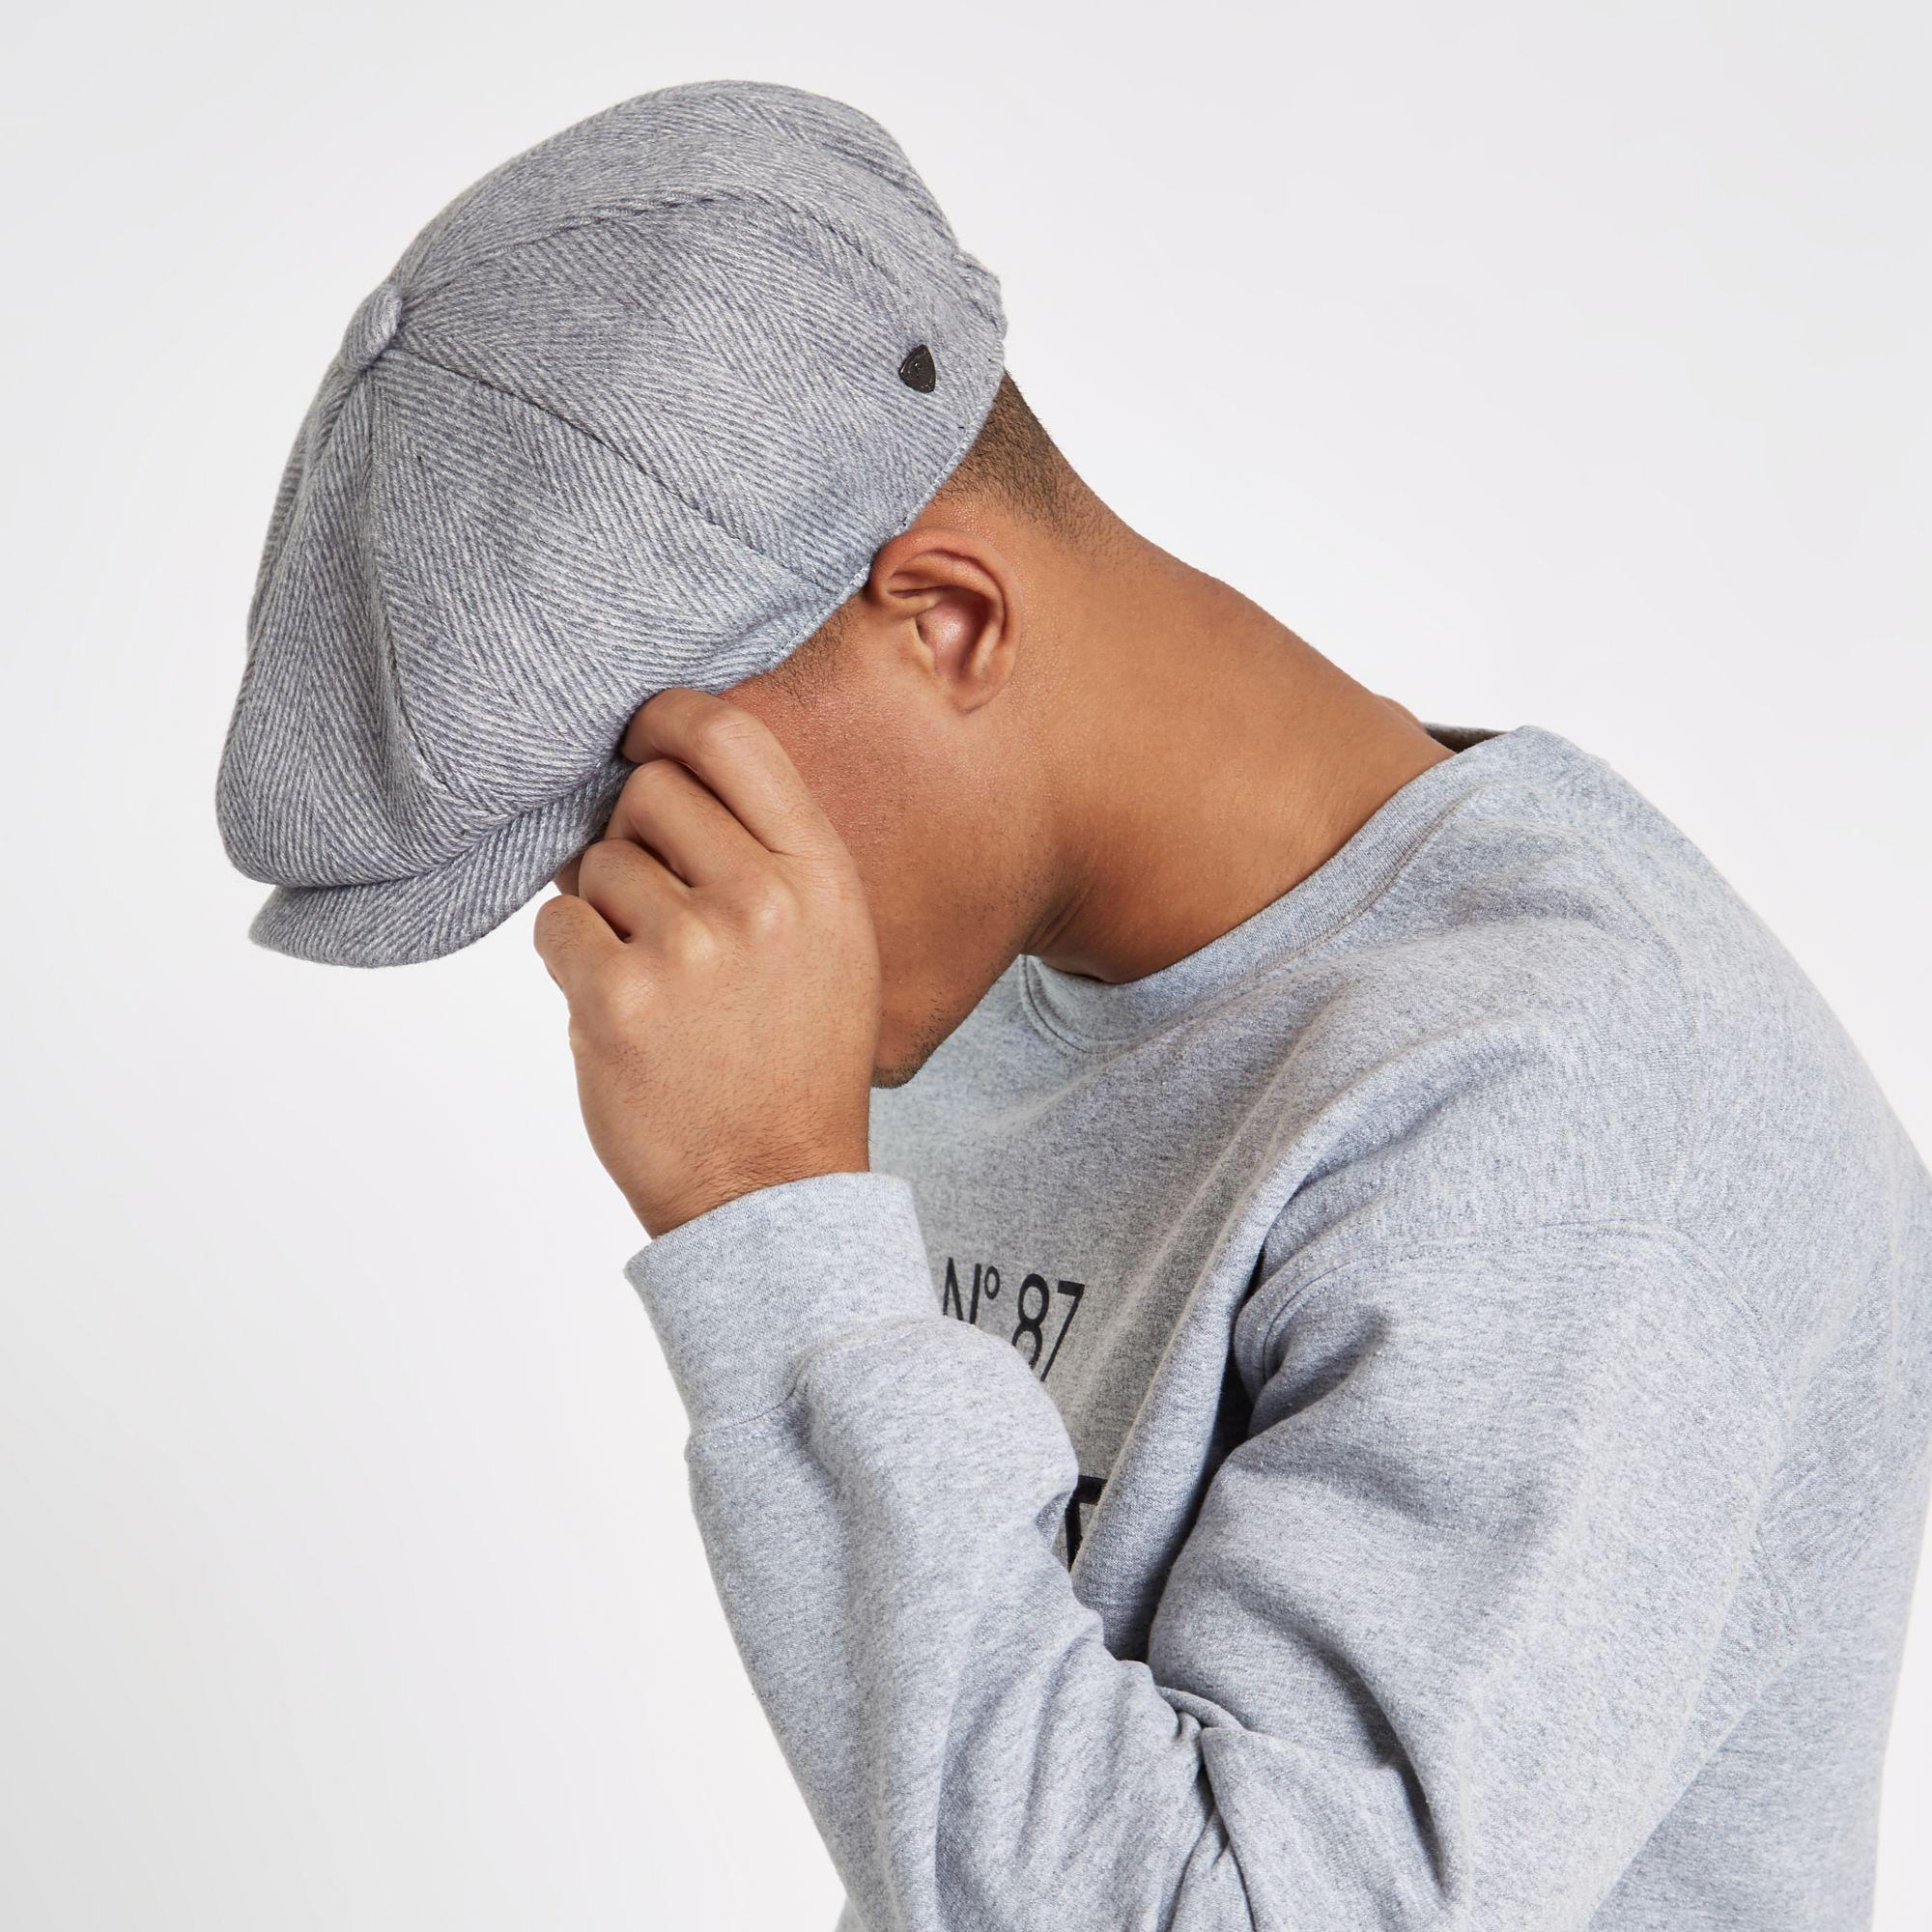 a369186c River Island Light Herringbone Baker Boy Hat in Gray for Men - Lyst